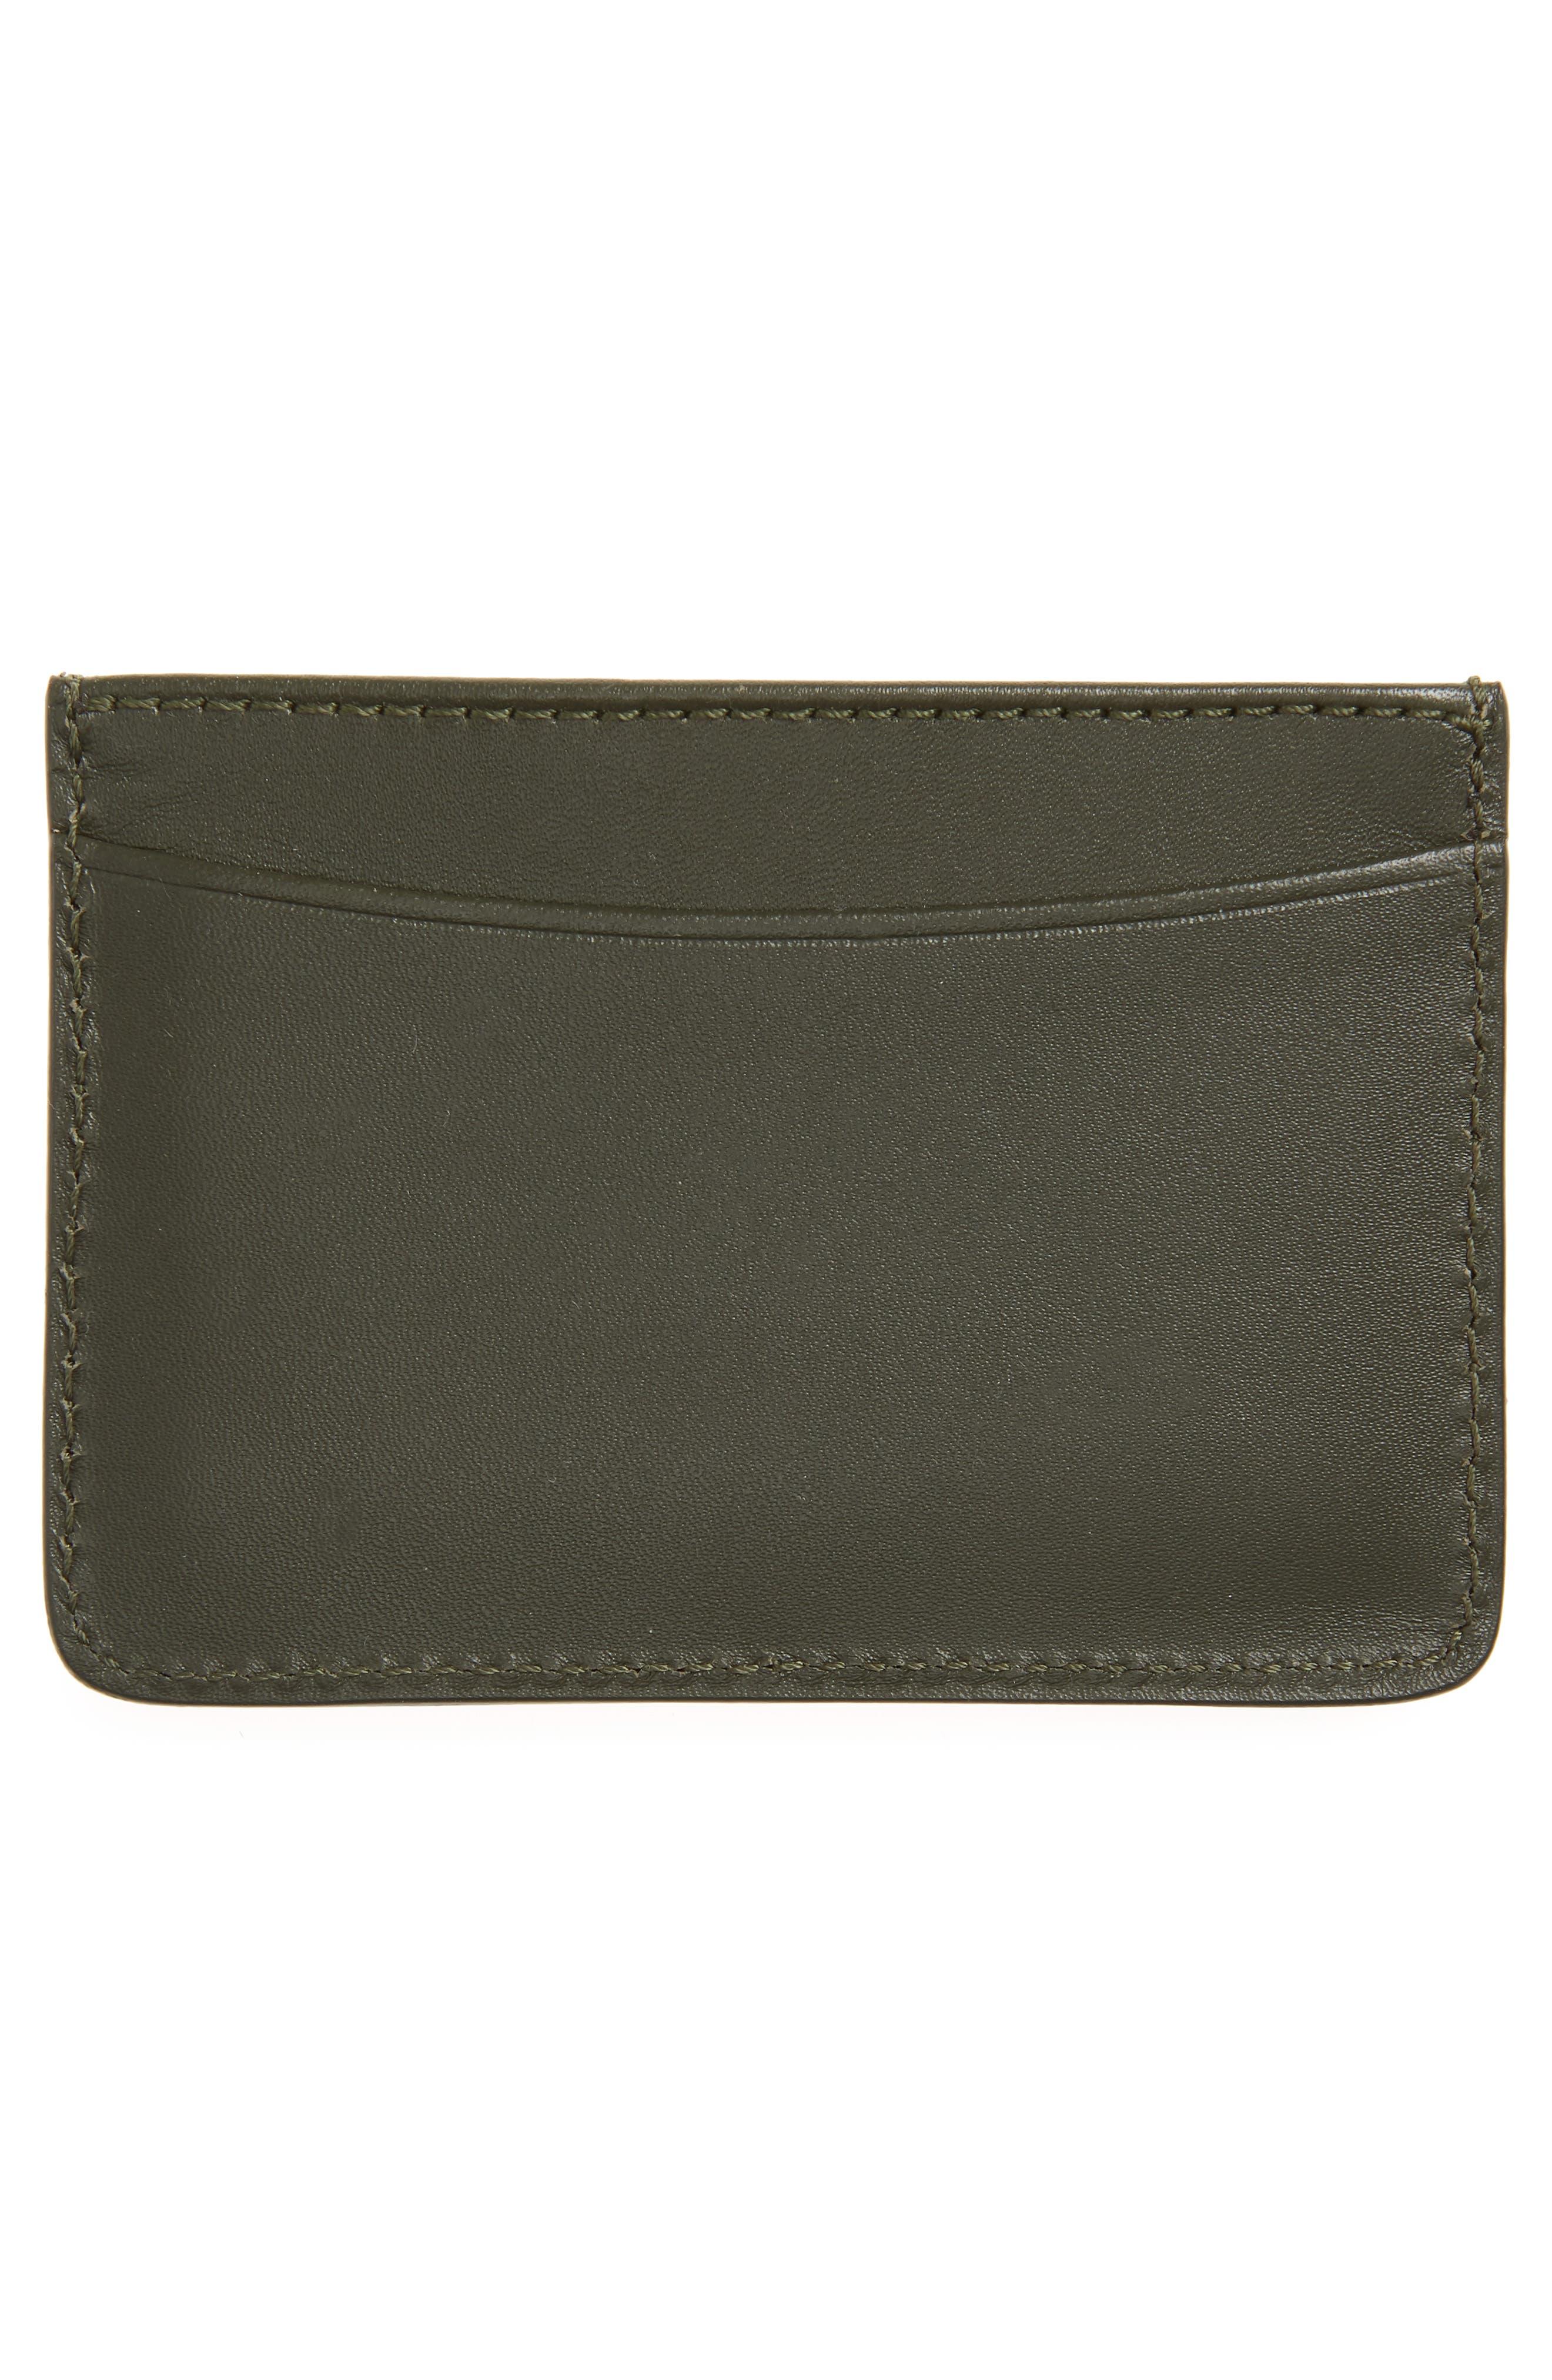 Andre Leather Card Case,                             Alternate thumbnail 2, color,                             Khaki